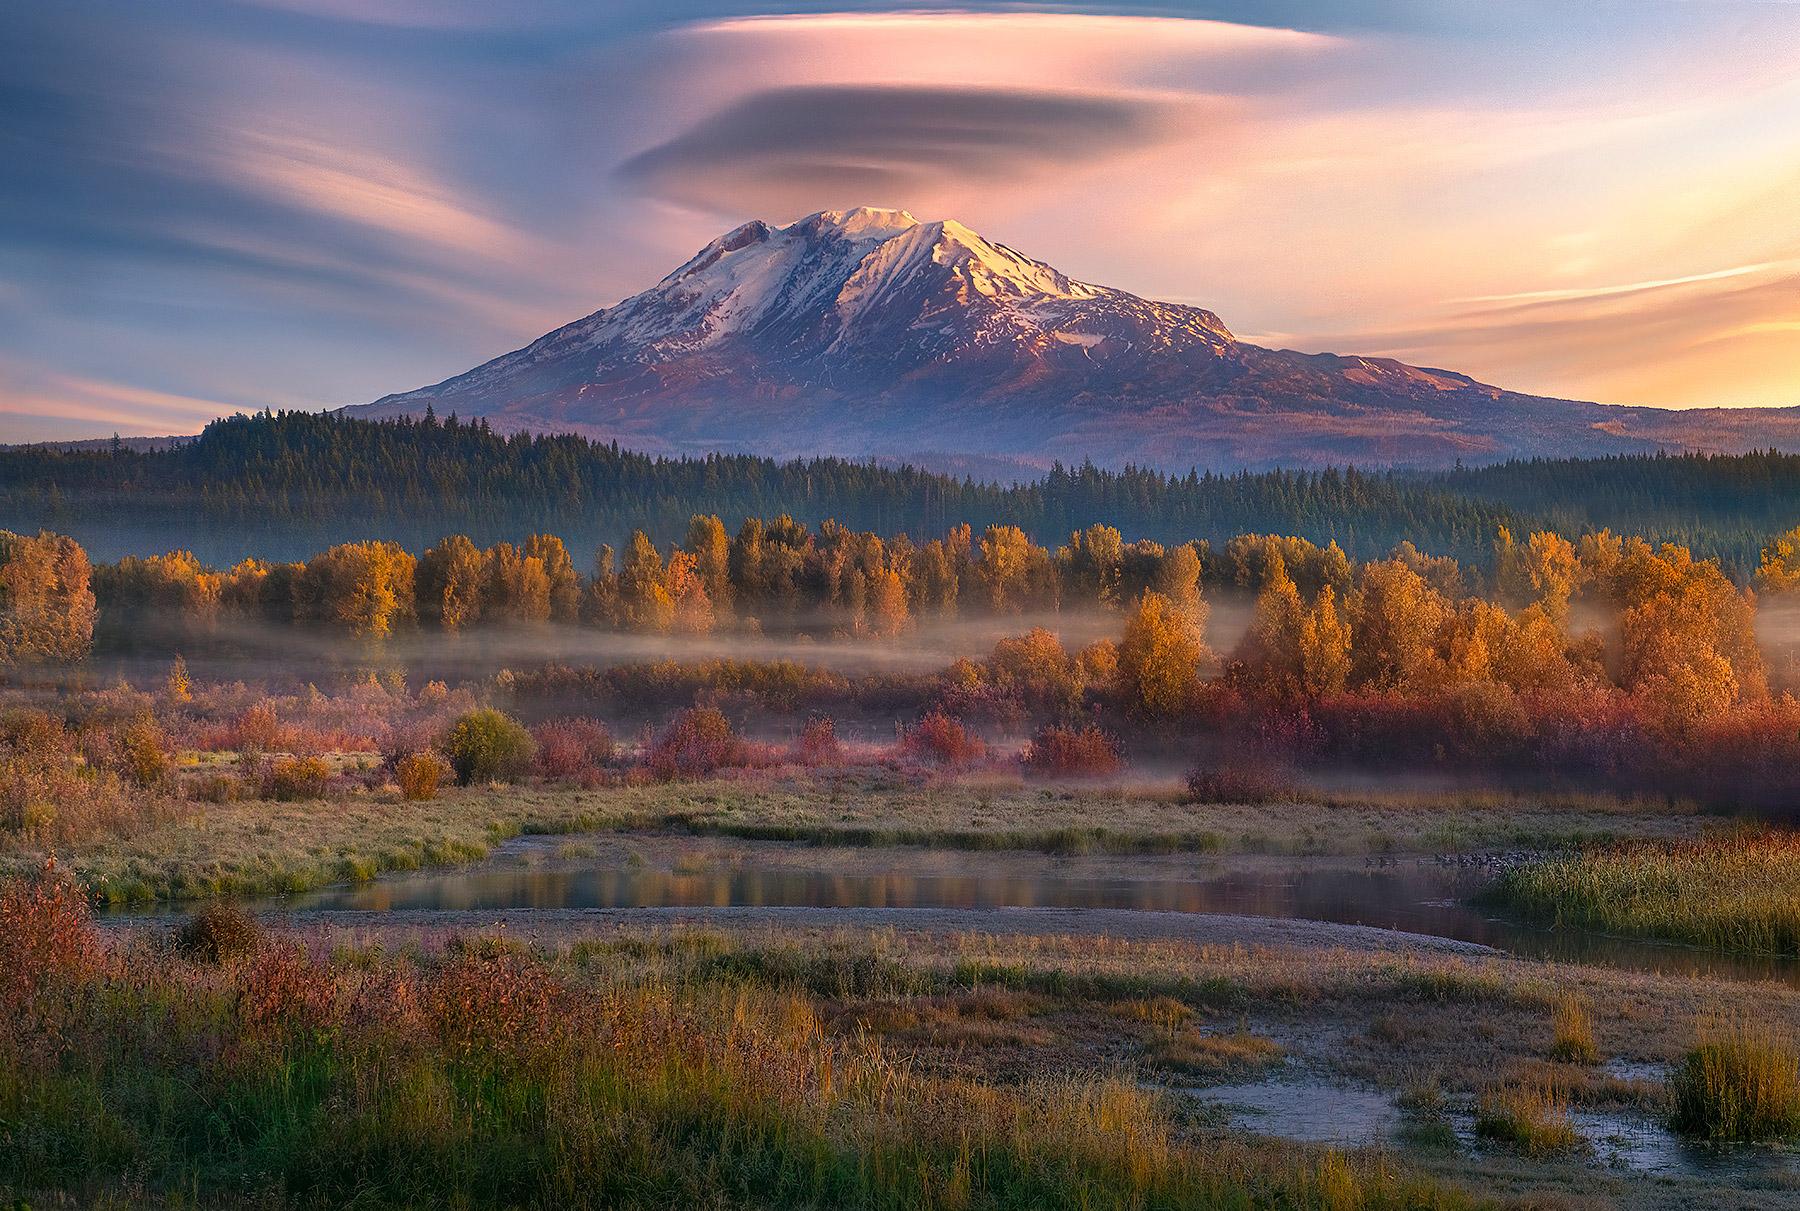 fall, Adams, volcano, clickitat, wetlands, autumn, mist, morning, Washington, photo